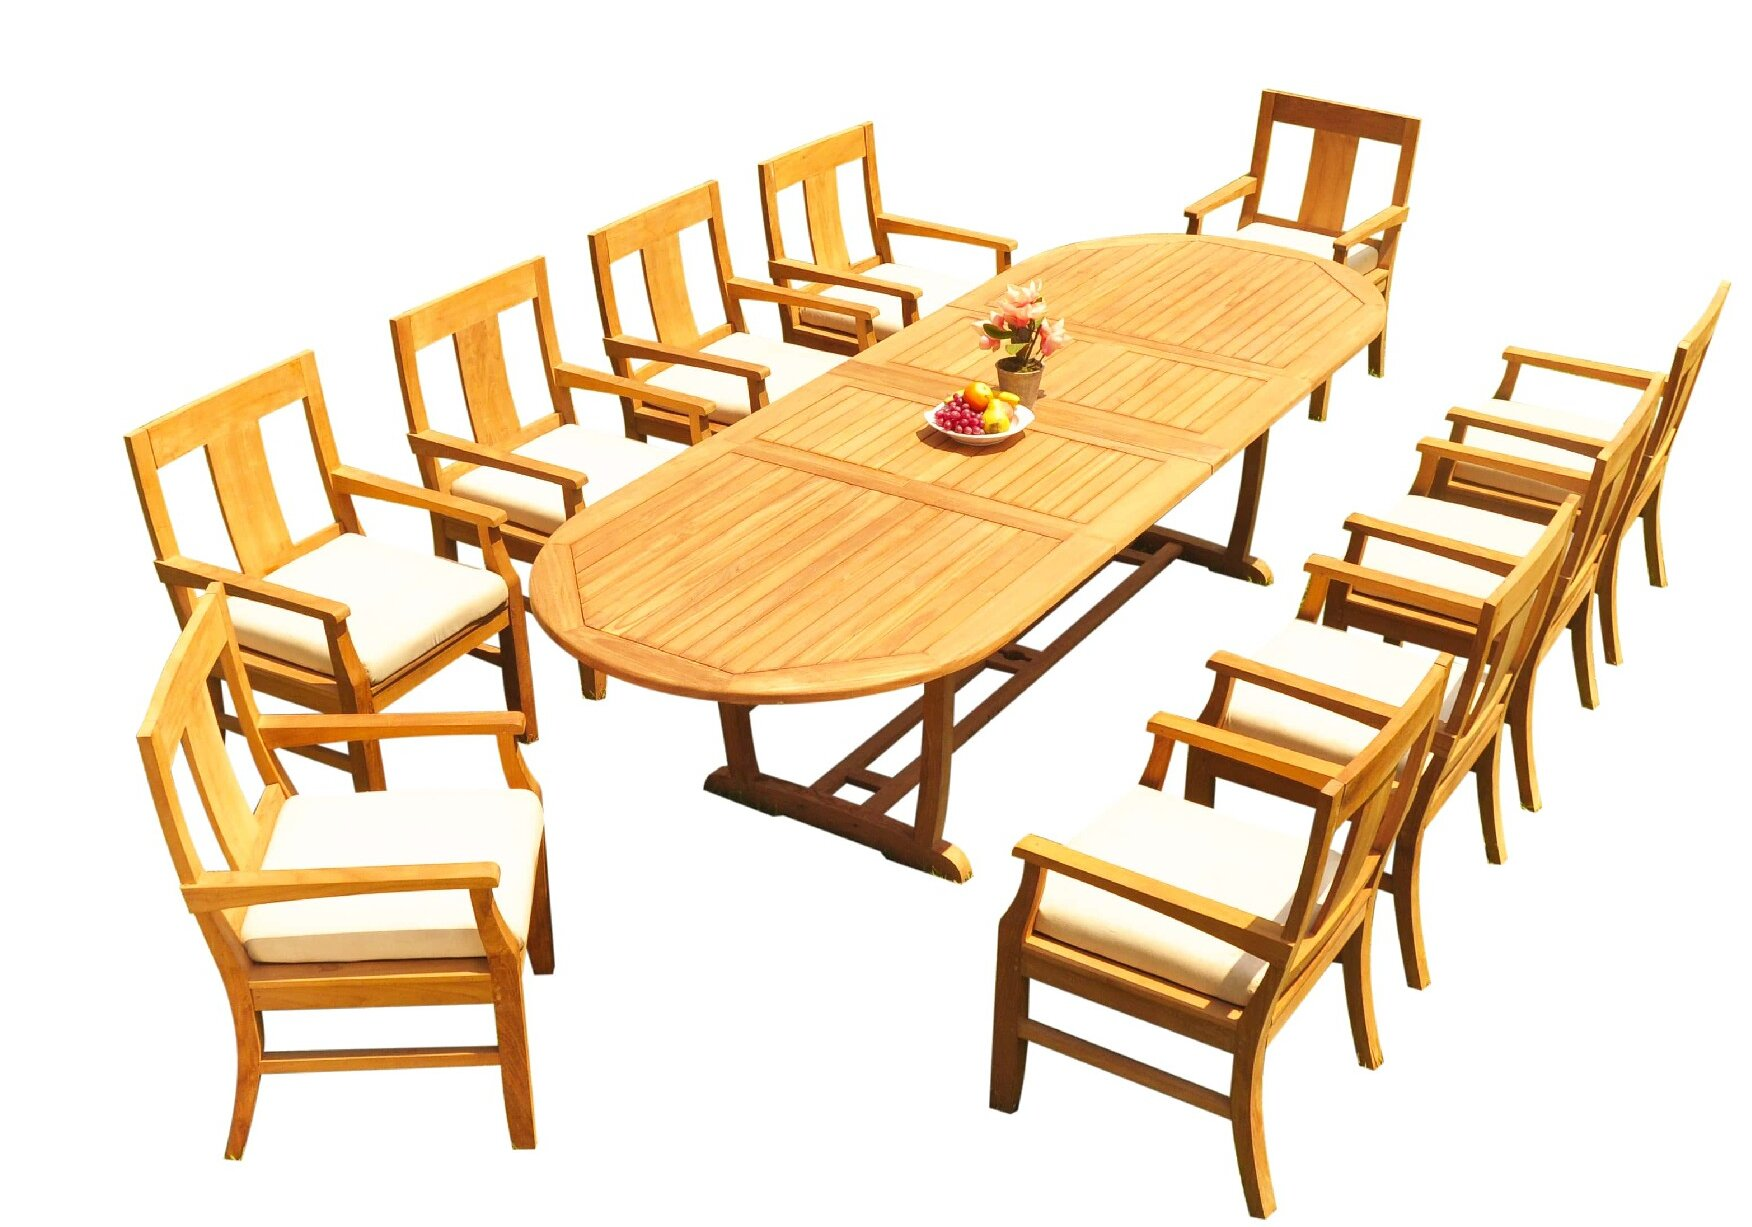 Cushionless Teak Patio Dining Sets You Ll Love In 2021 Wayfair